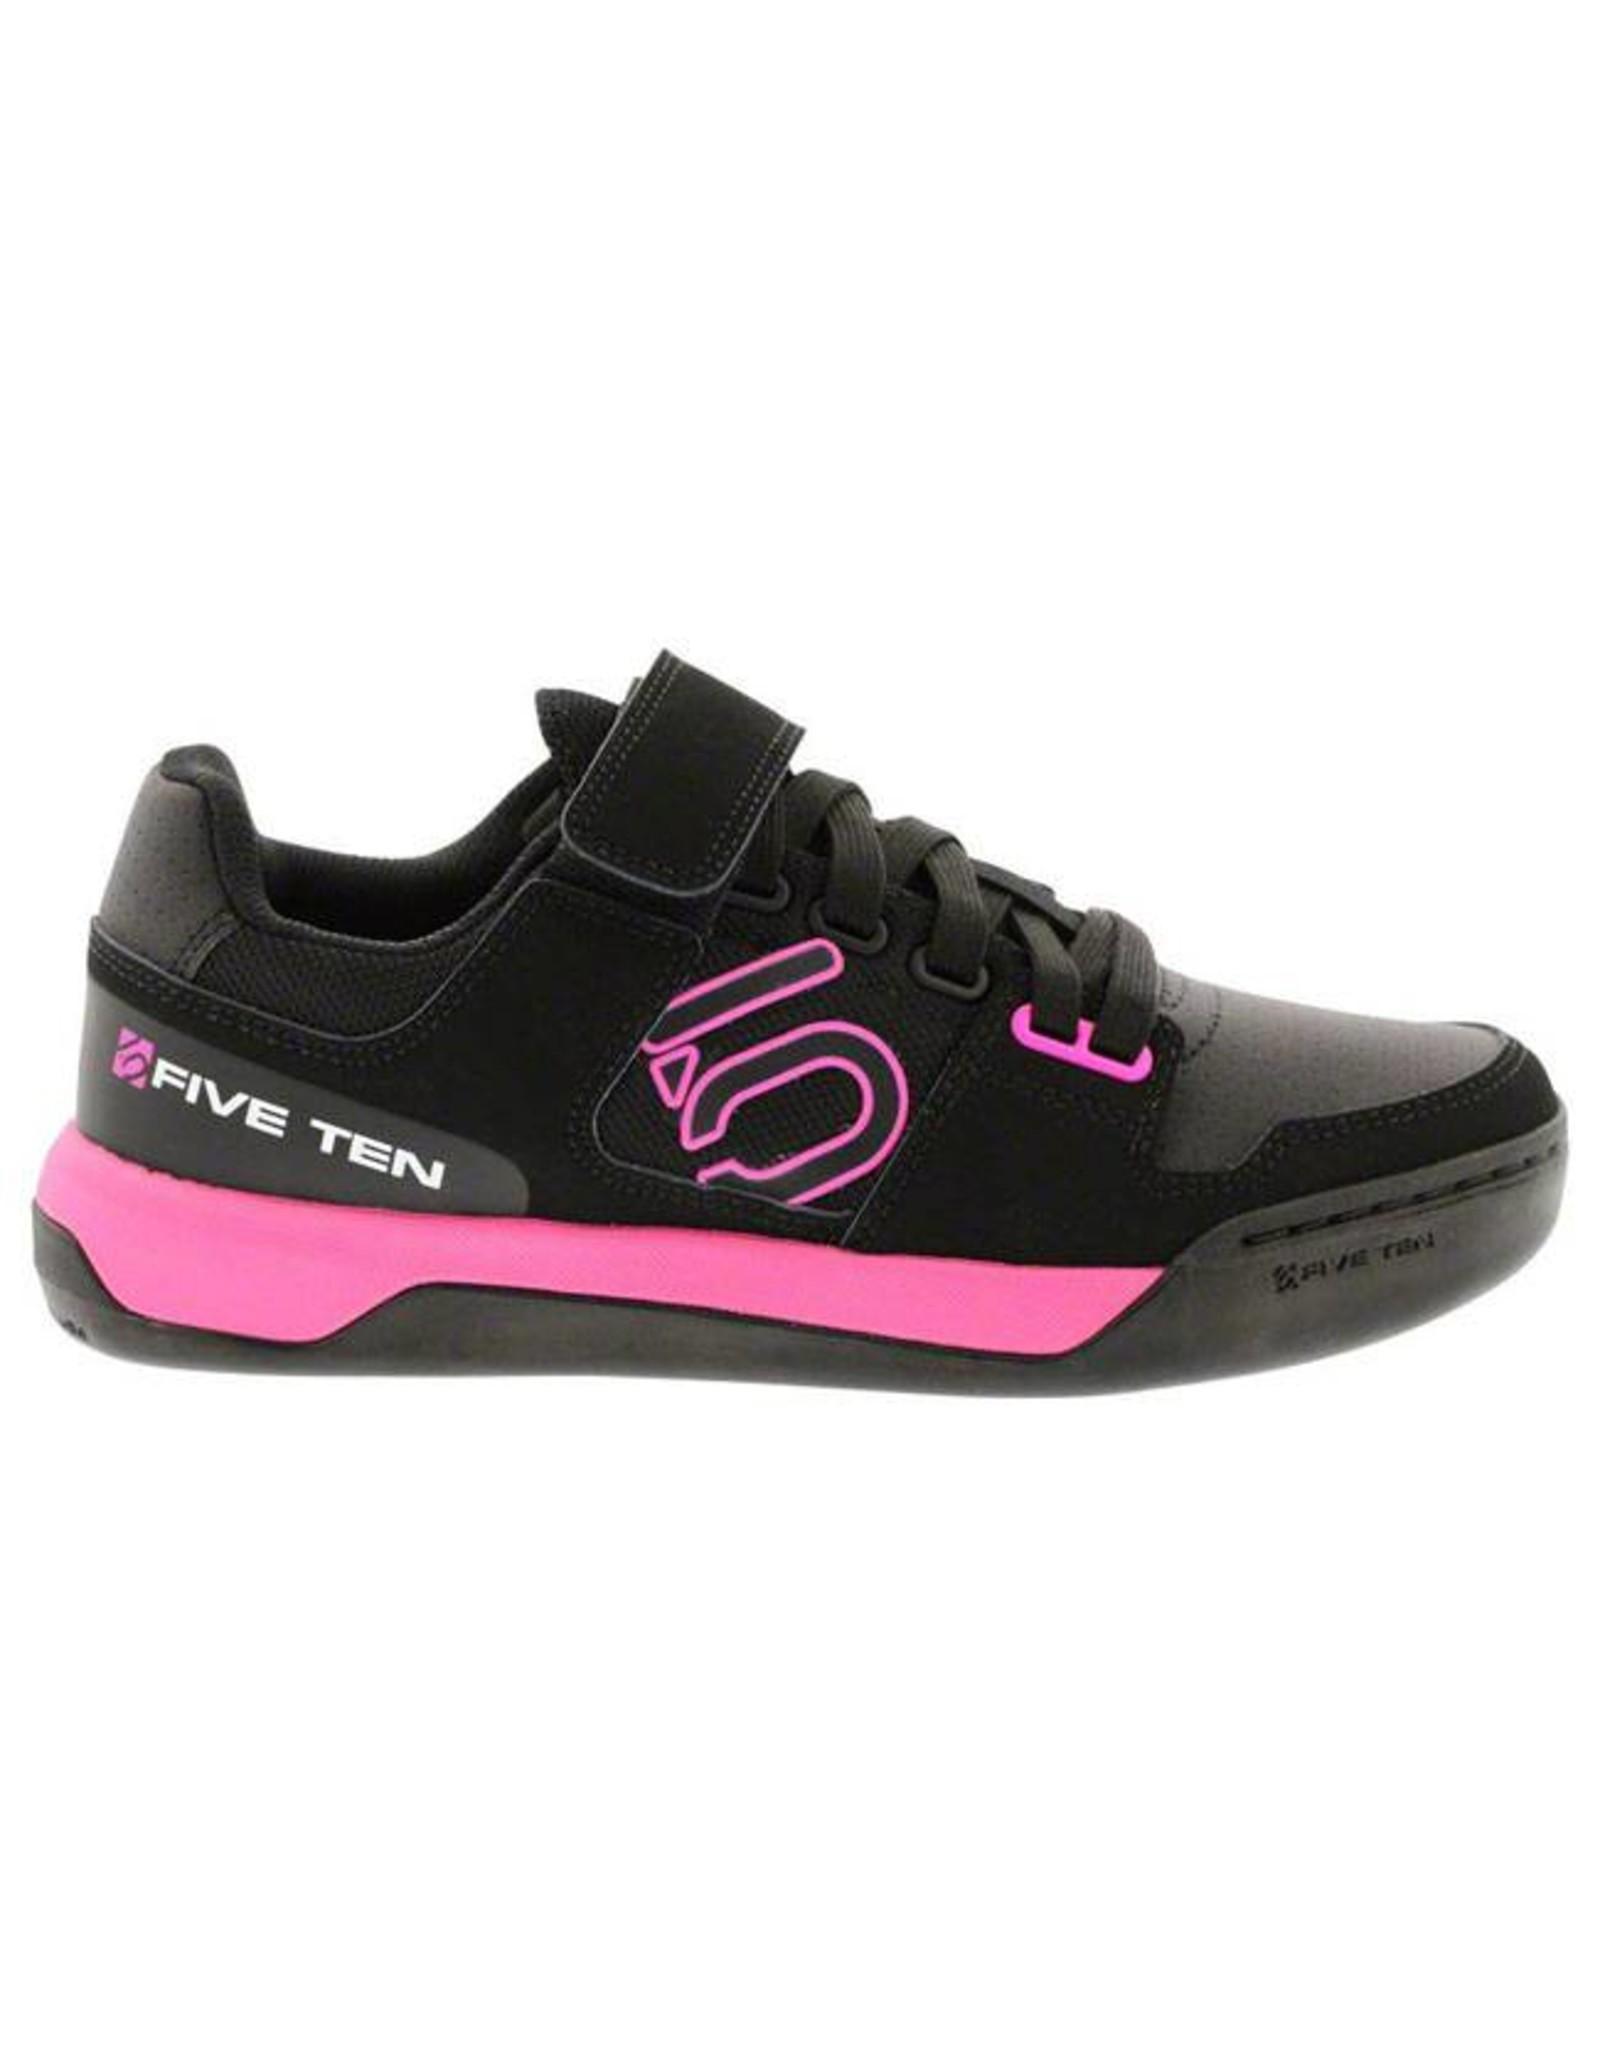 Five Ten Five Ten Hellcat Women's Clipless/Flat Pedal Shoe: Shock Pink 9.5